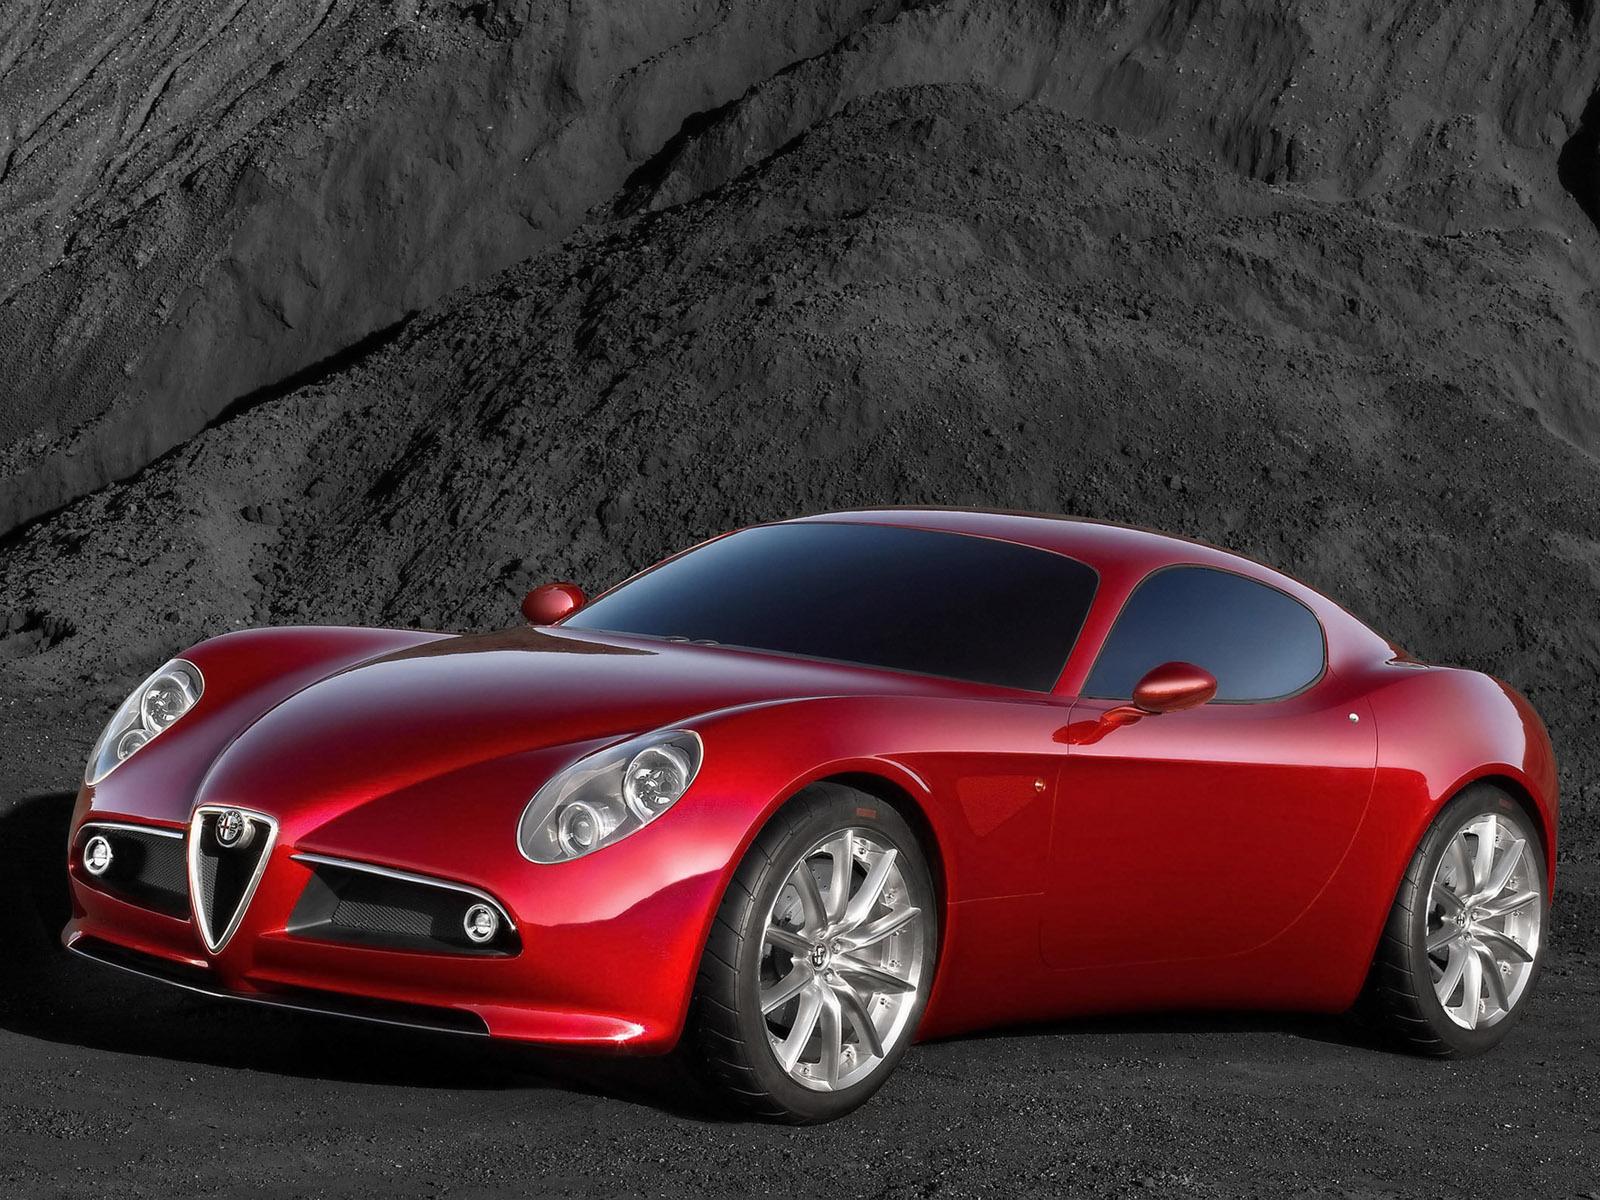 alfa romeo spider 1 luxury and fast cars. Black Bedroom Furniture Sets. Home Design Ideas